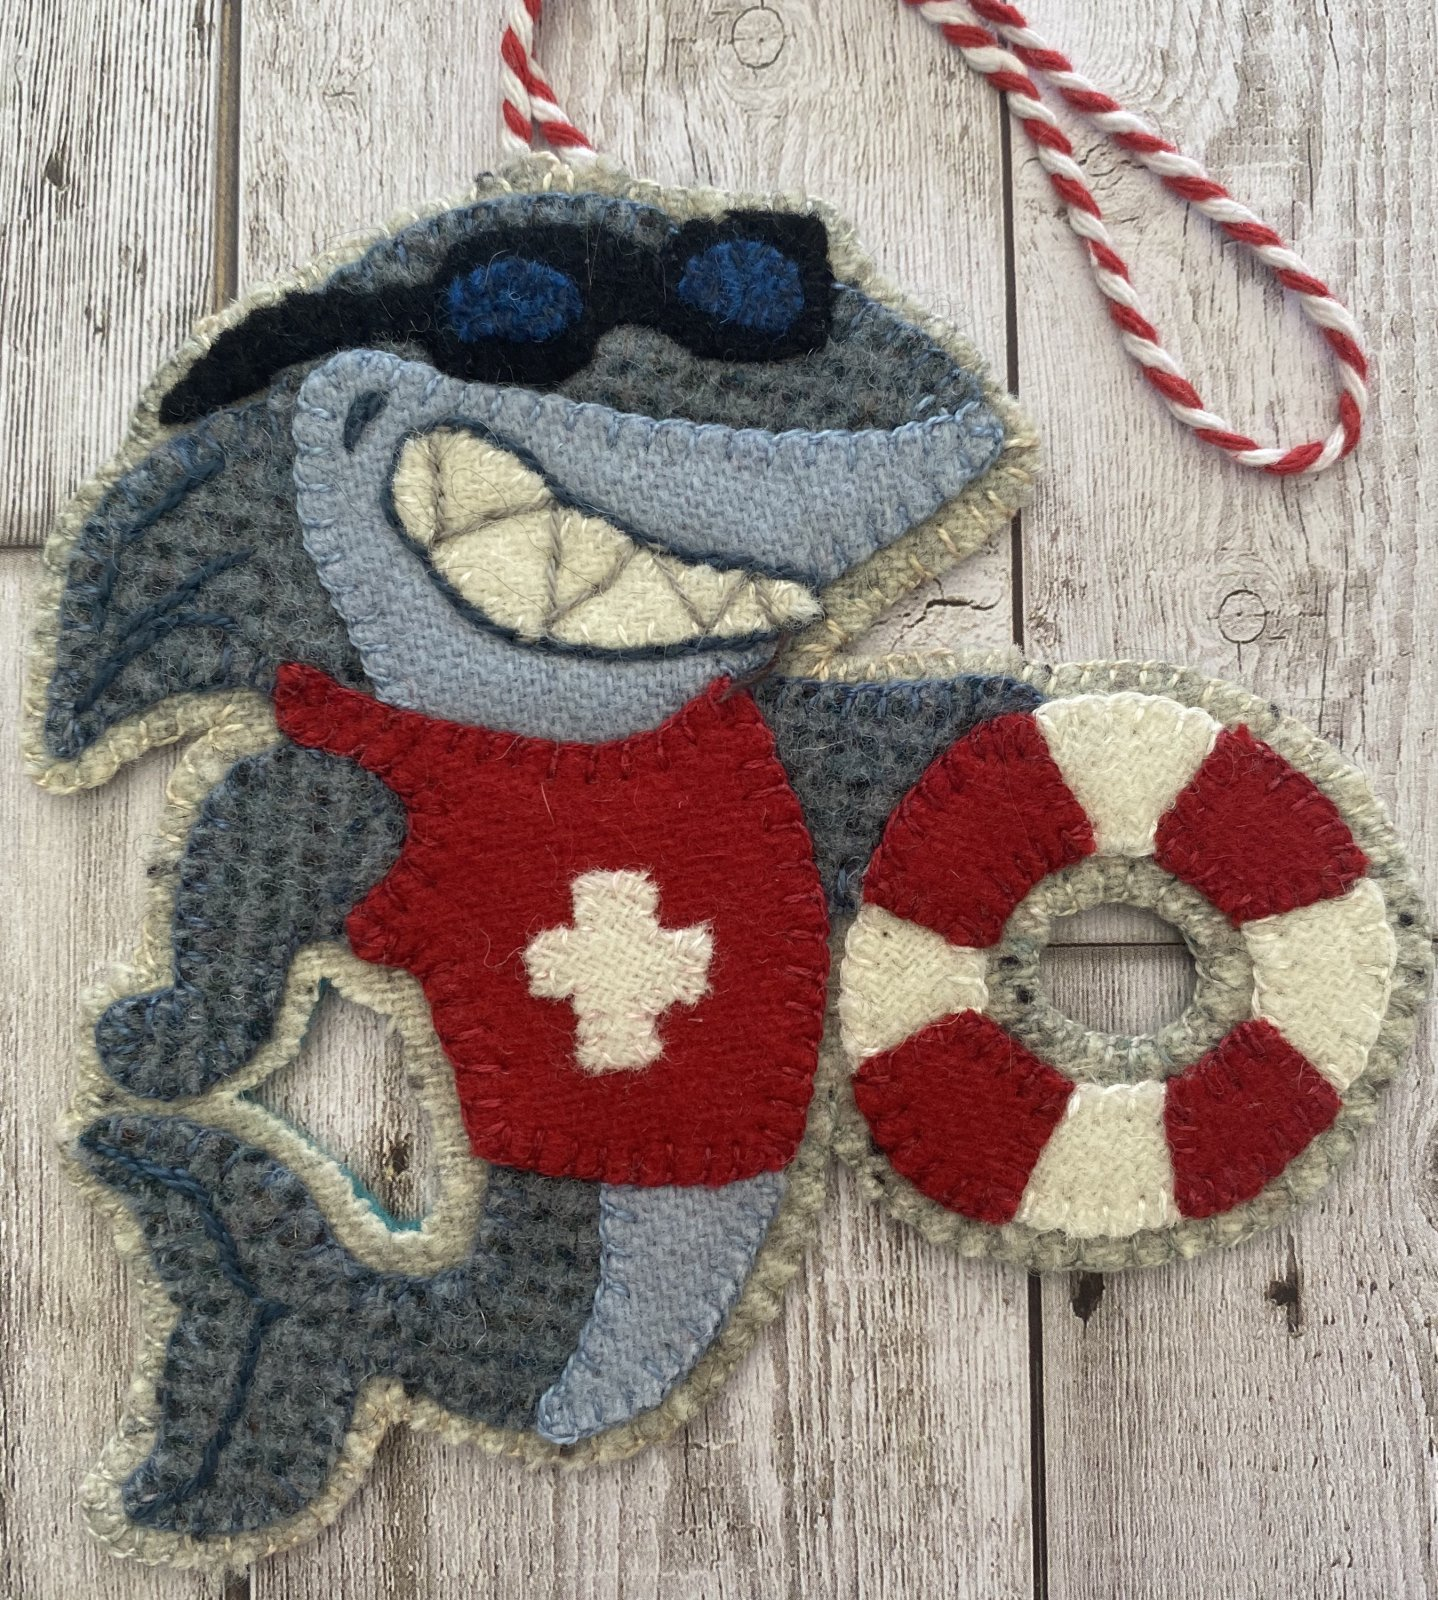 Great White Lifeguard Shark Christmas by the Sea Bonus Ornament Download